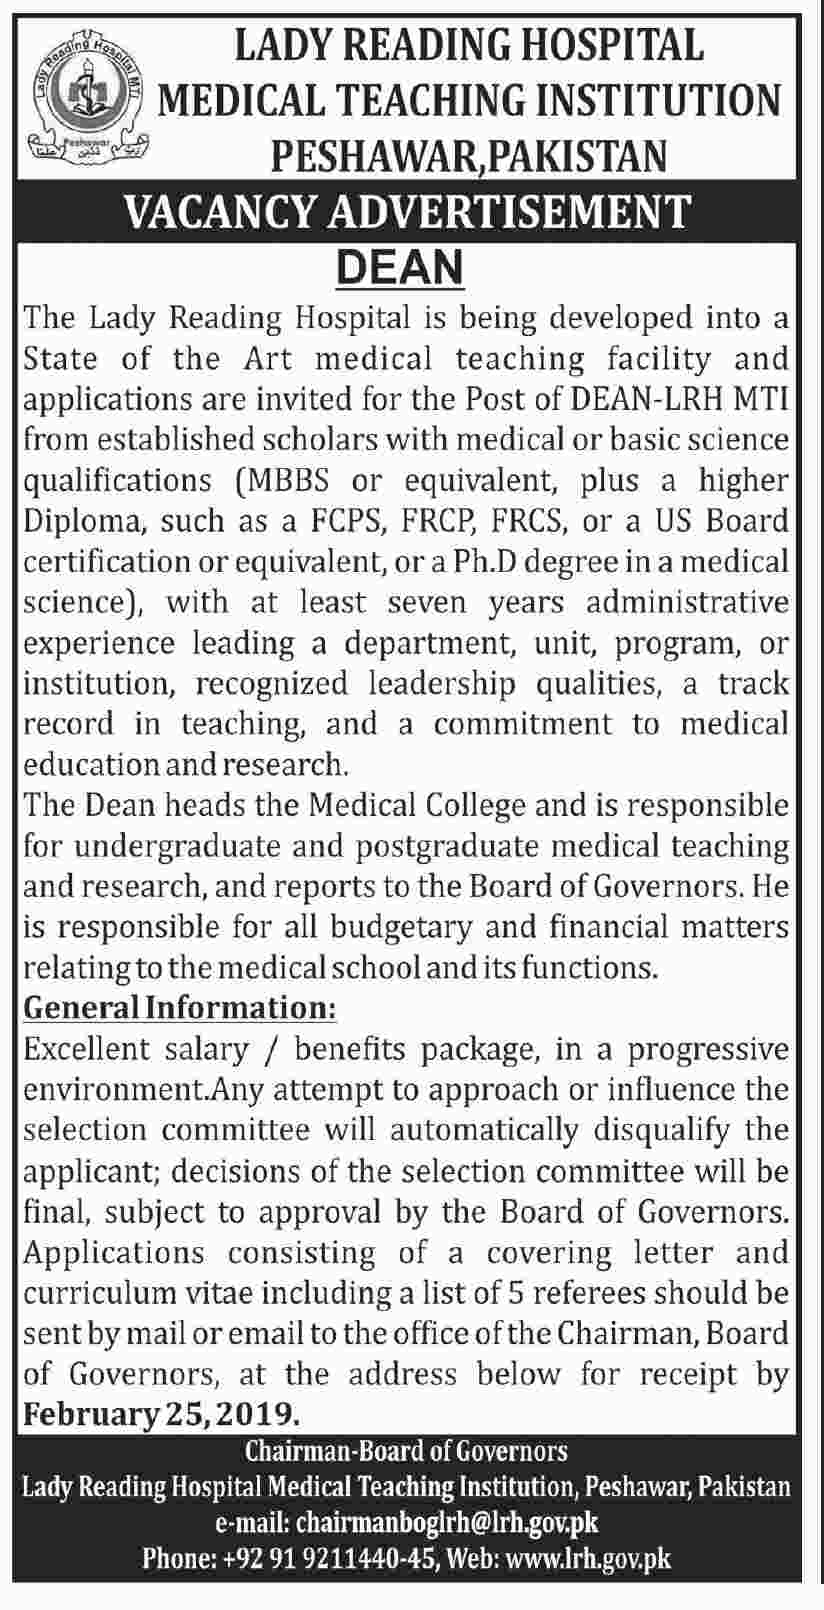 Lady Reading Hospital LRH Peshawar Jobs 2019 for Dean